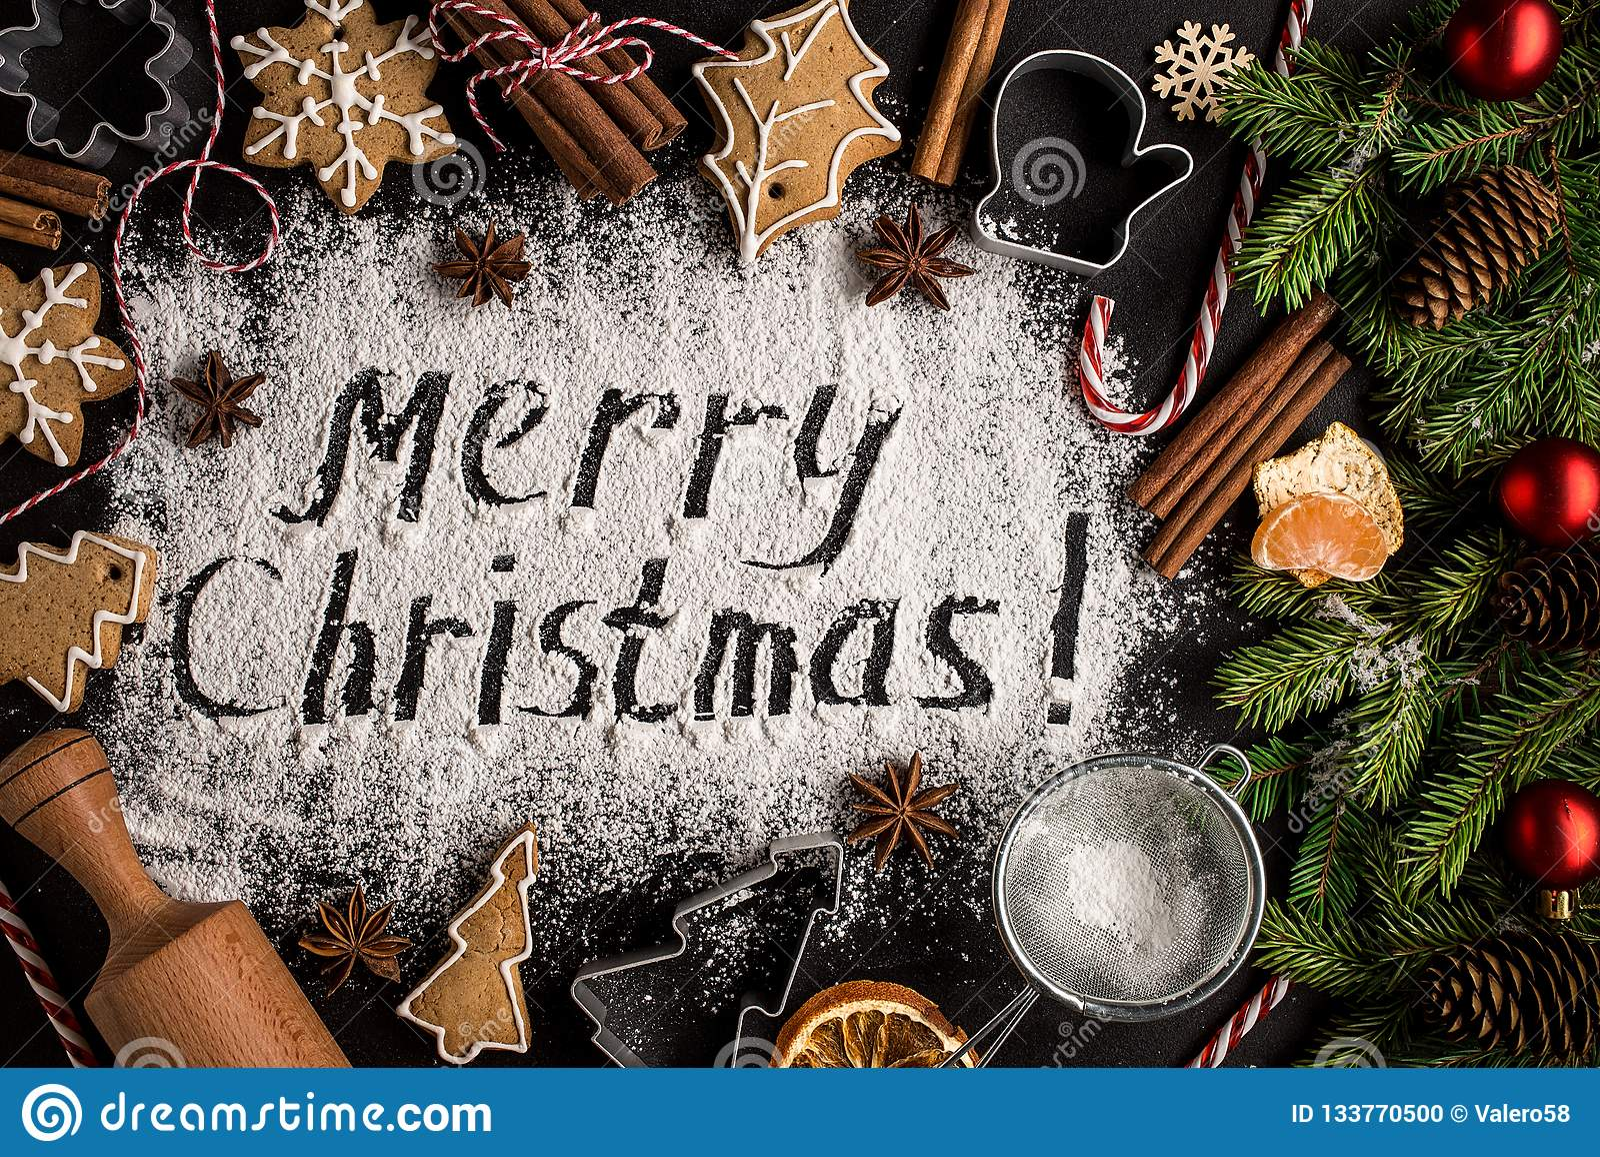 Inscription MERRY CHRISTMAS on powdered sugar background.